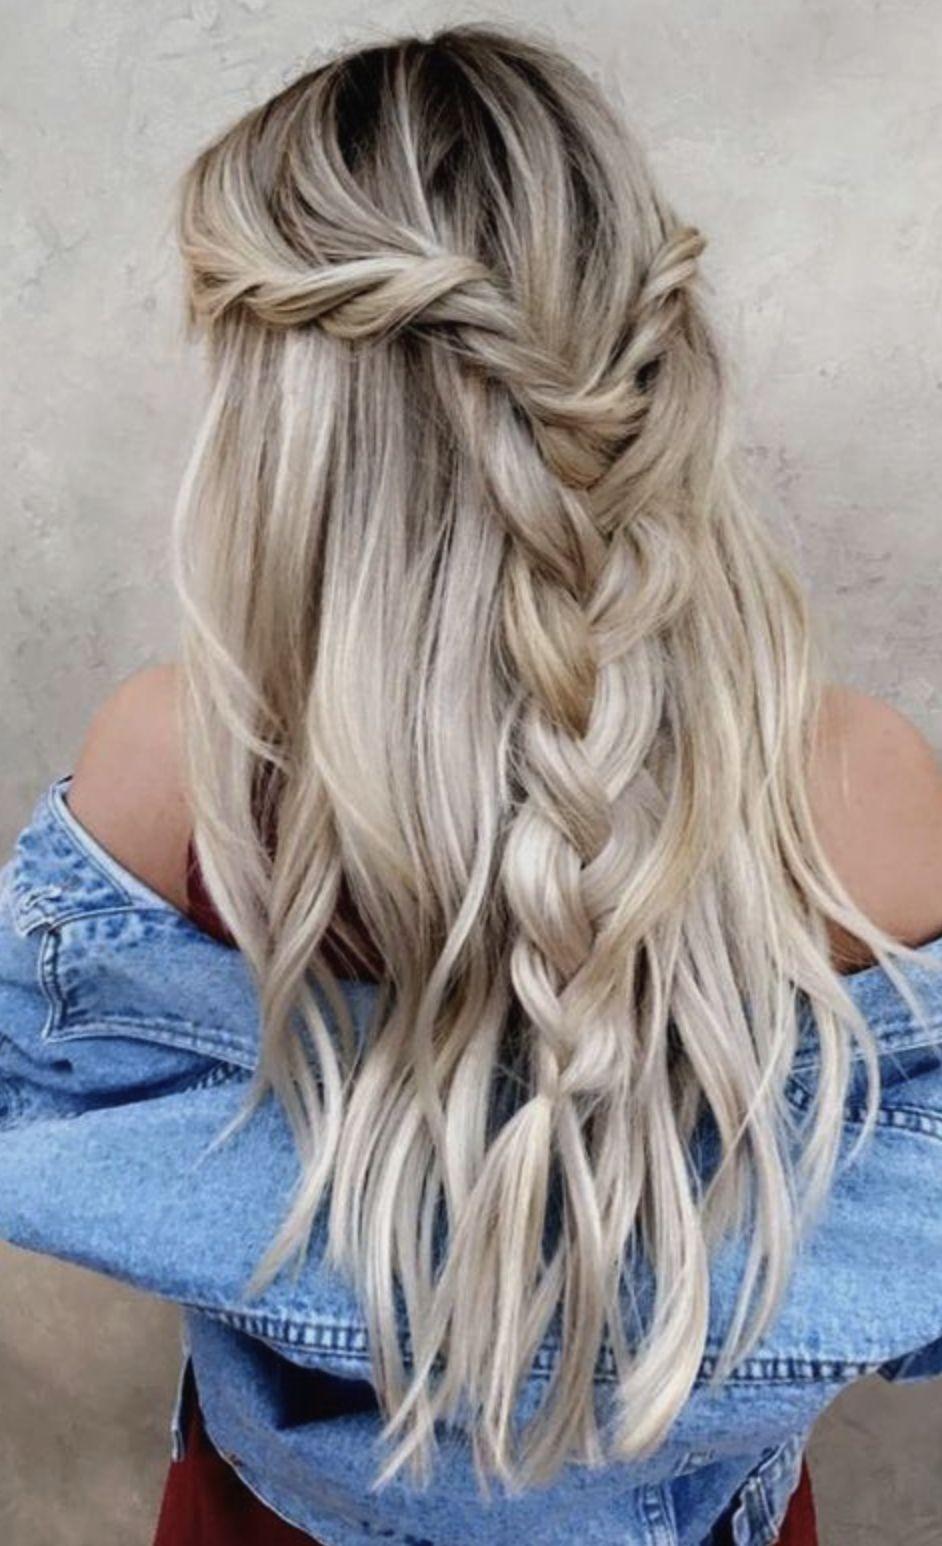 Hair Inspiration 2019-07-04 05:36:02